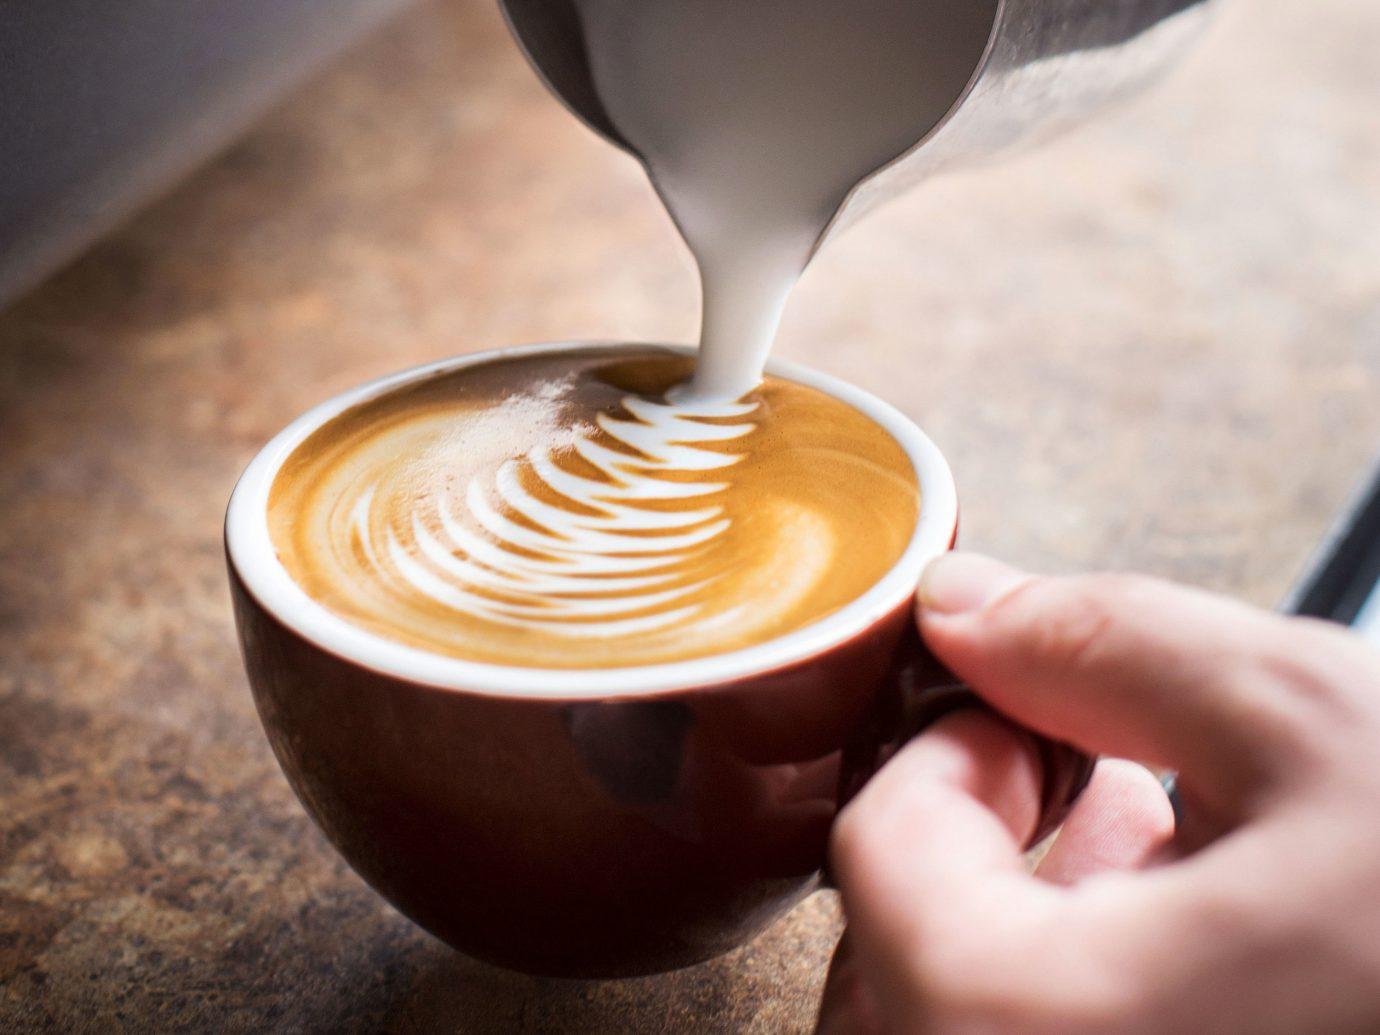 Food + Drink cup coffee indoor Drink beverage caffeine coffee cup espresso cappuccino flavor latte